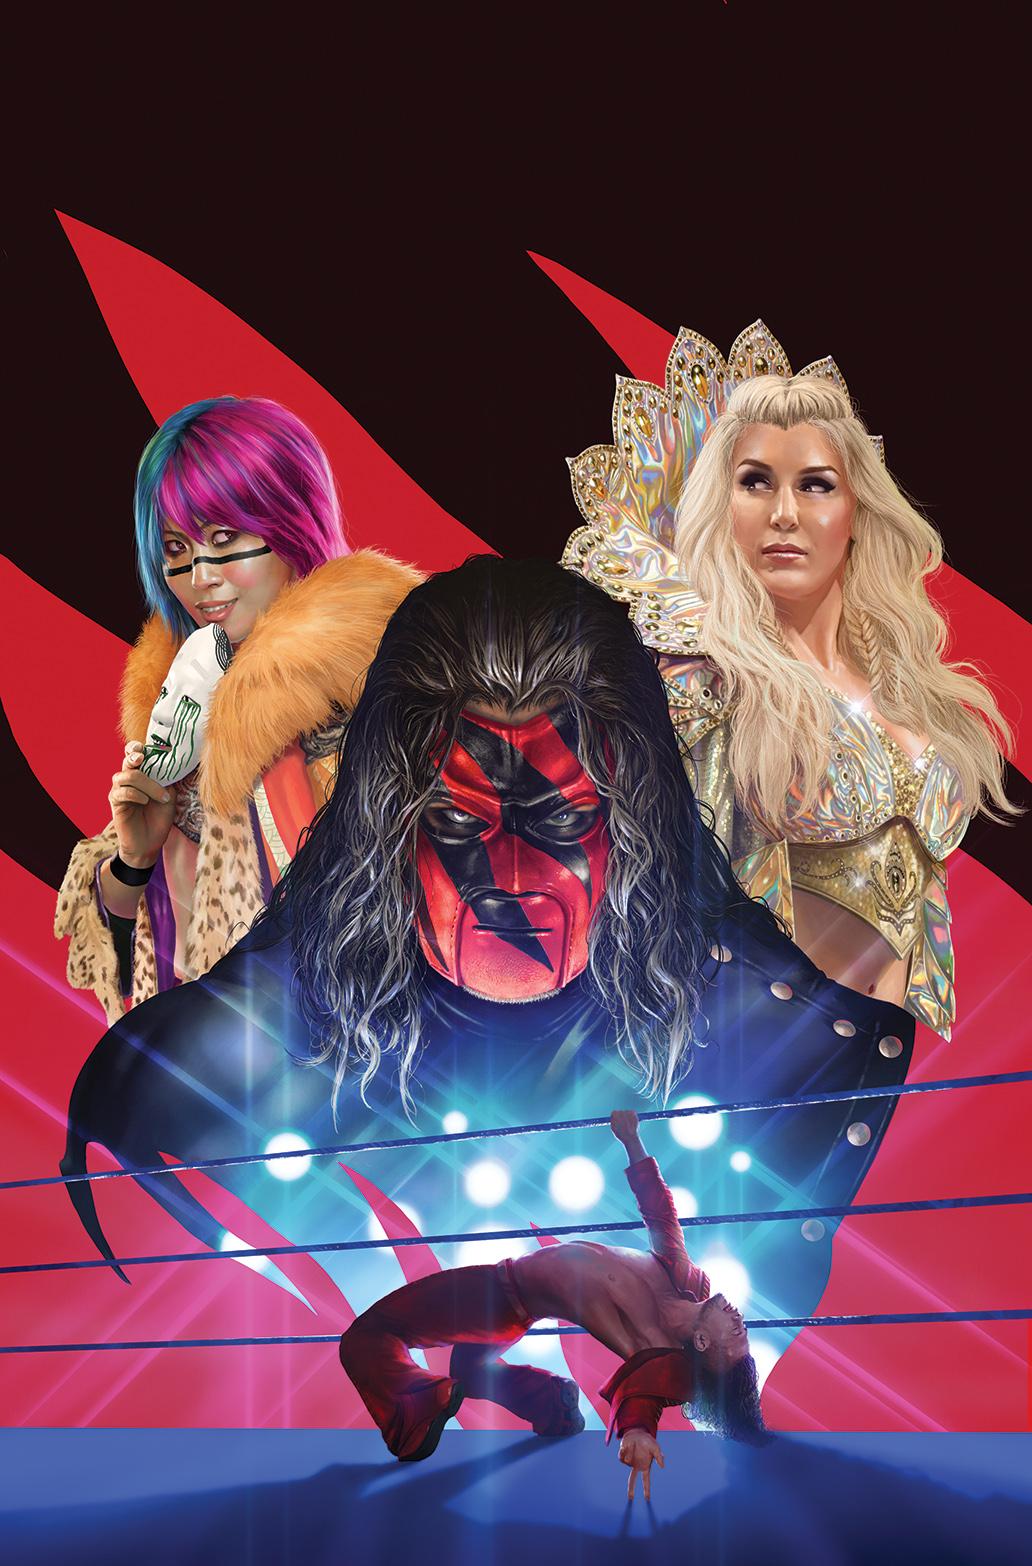 01_BOOM_WWE_Wrestlemania2019_001_Main.jpg